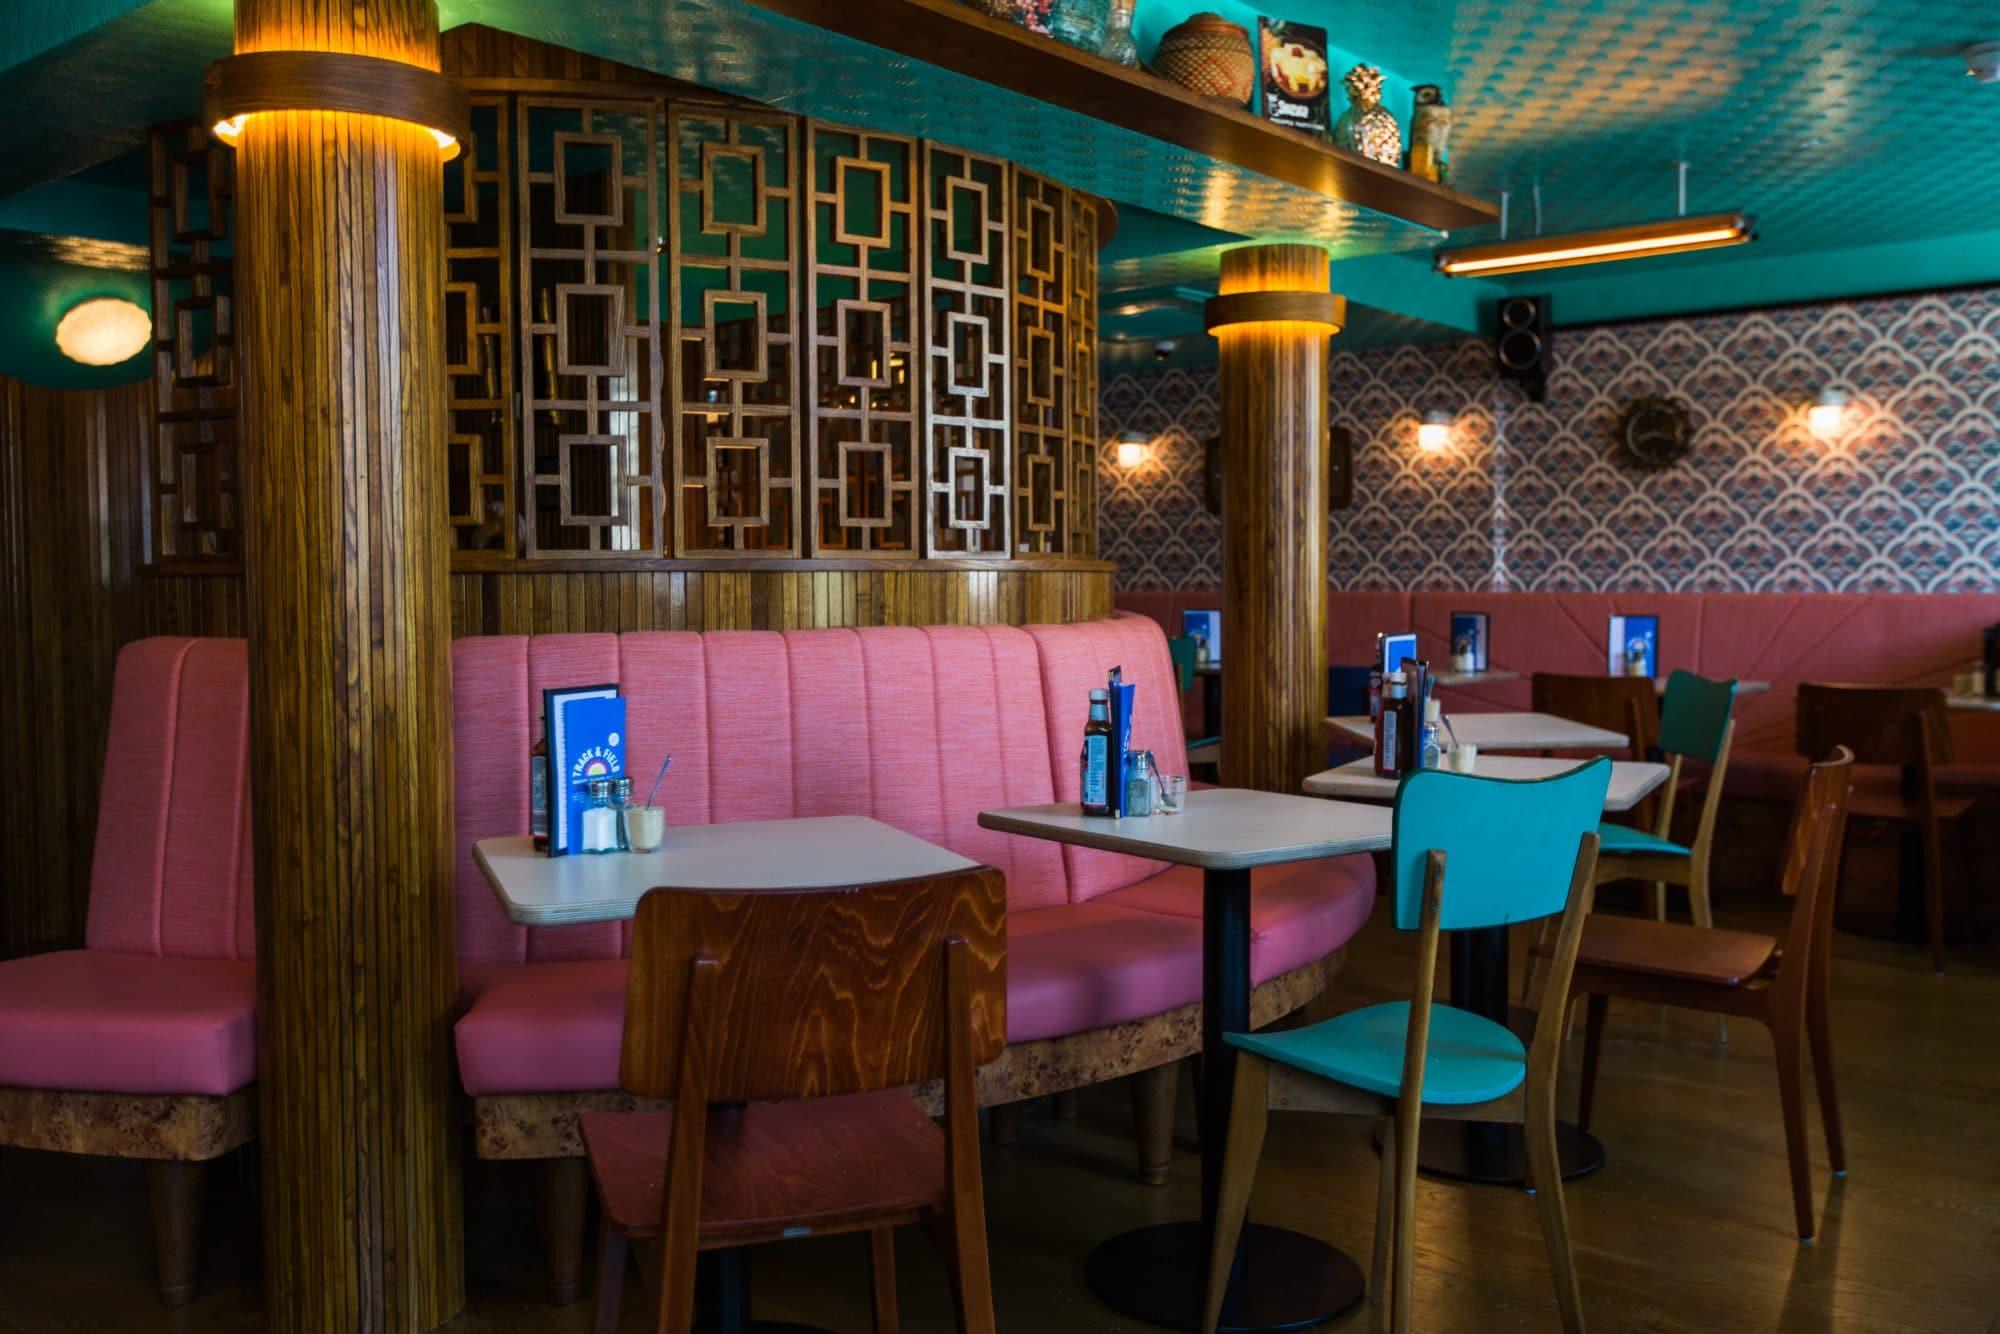 Interior at The Breakfast Club in Brighton